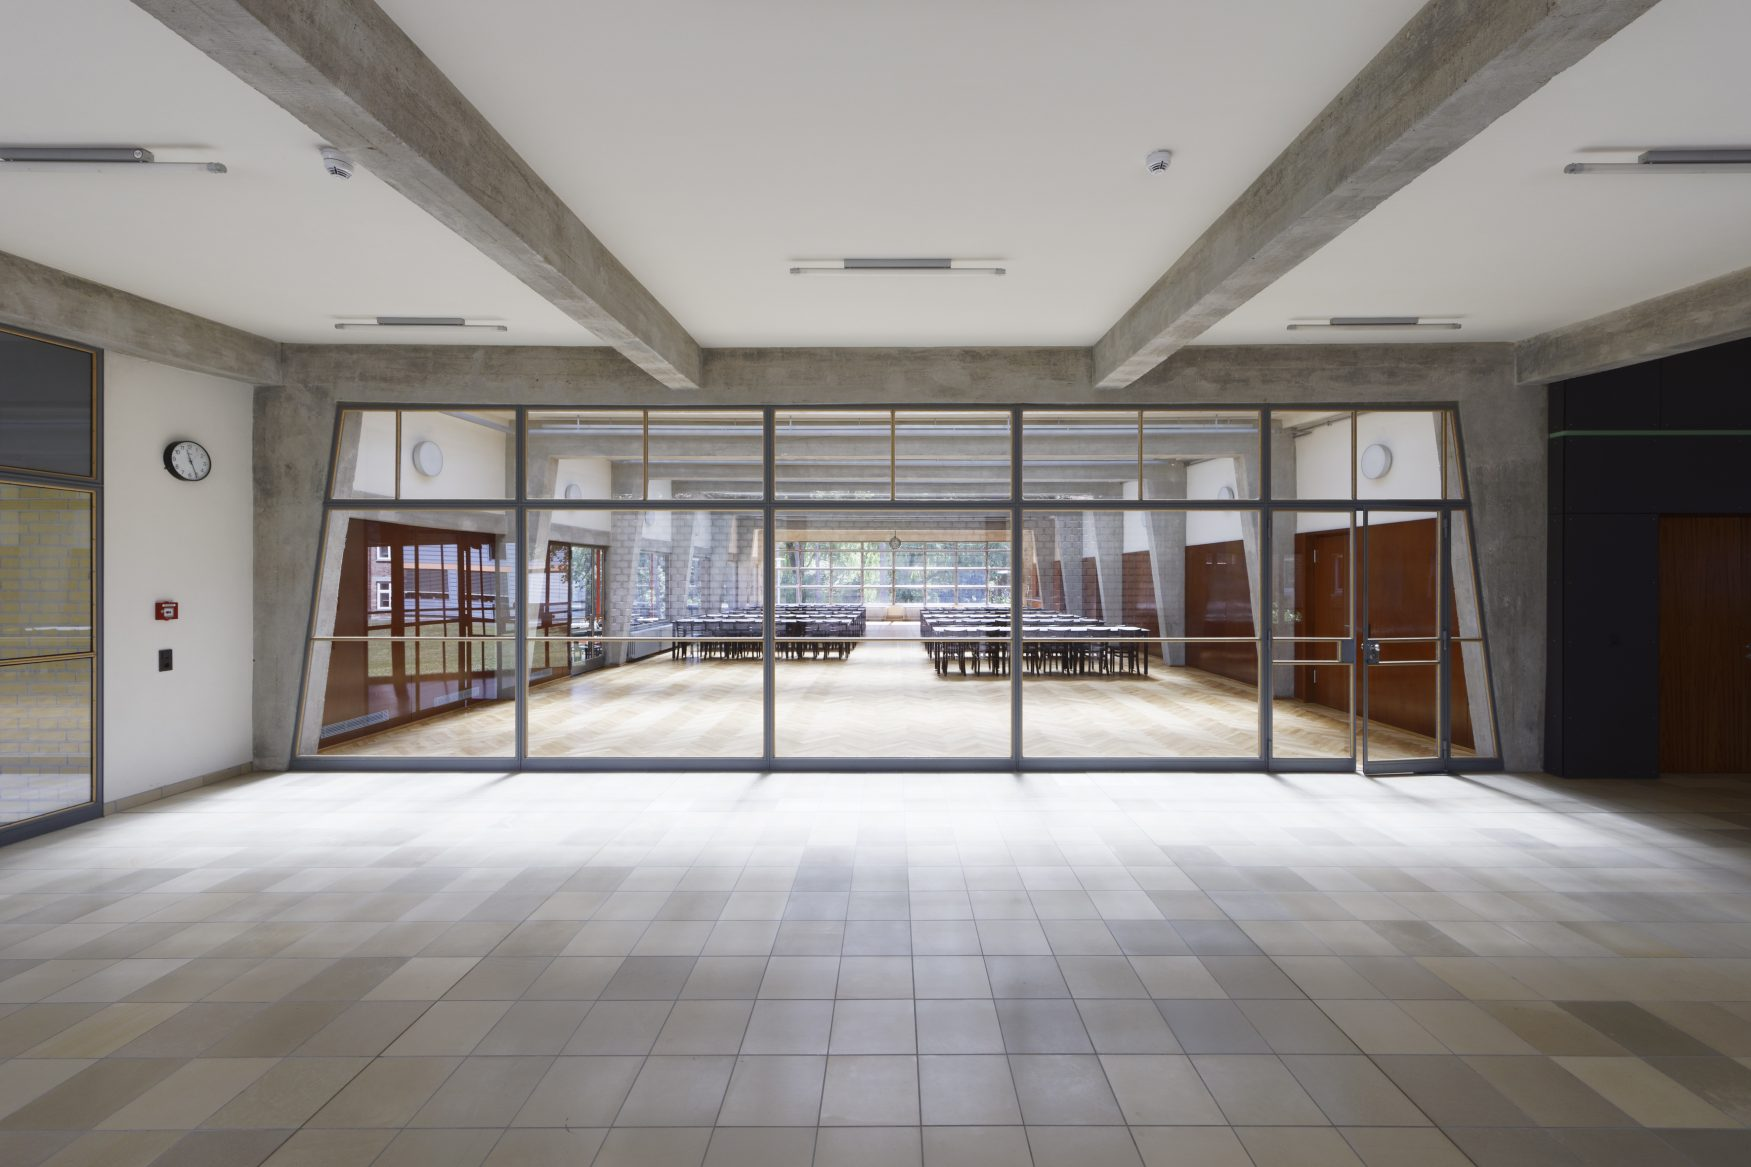 Bauhaus Denkmal Bundesschule Bernau: Blick in das foyer/speisesaa,l, Foto: Eberle & Eisfeld